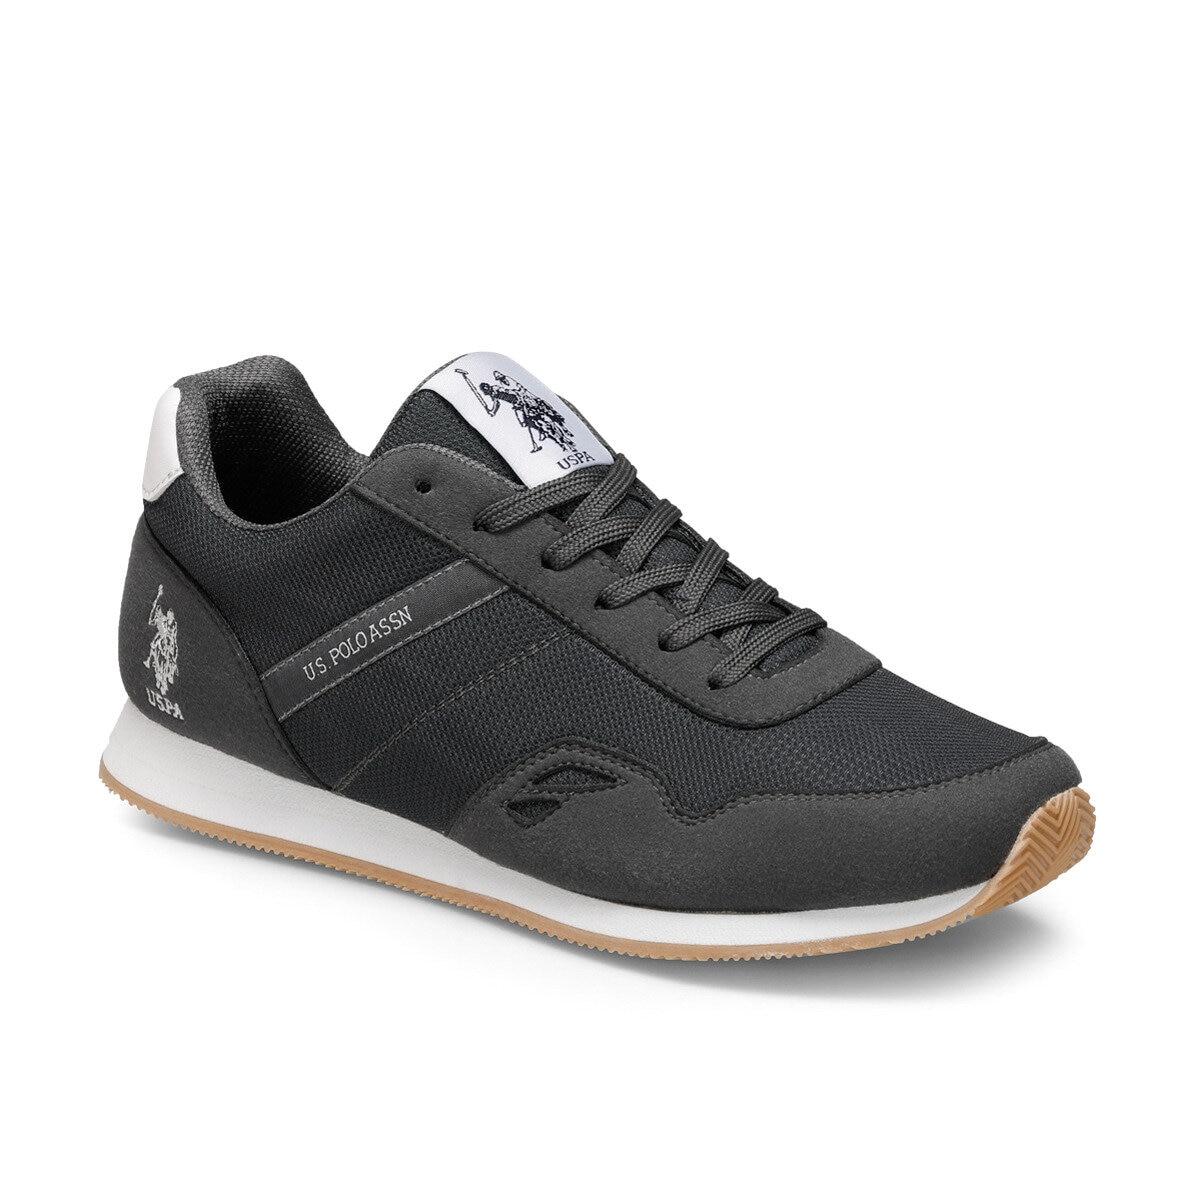 Zapatillas deportivas FLO para hombre, zapatillas deportivas informales con cordones para hombre, zapatillas POLO ASSN de ee.uu. ANDREW Gray